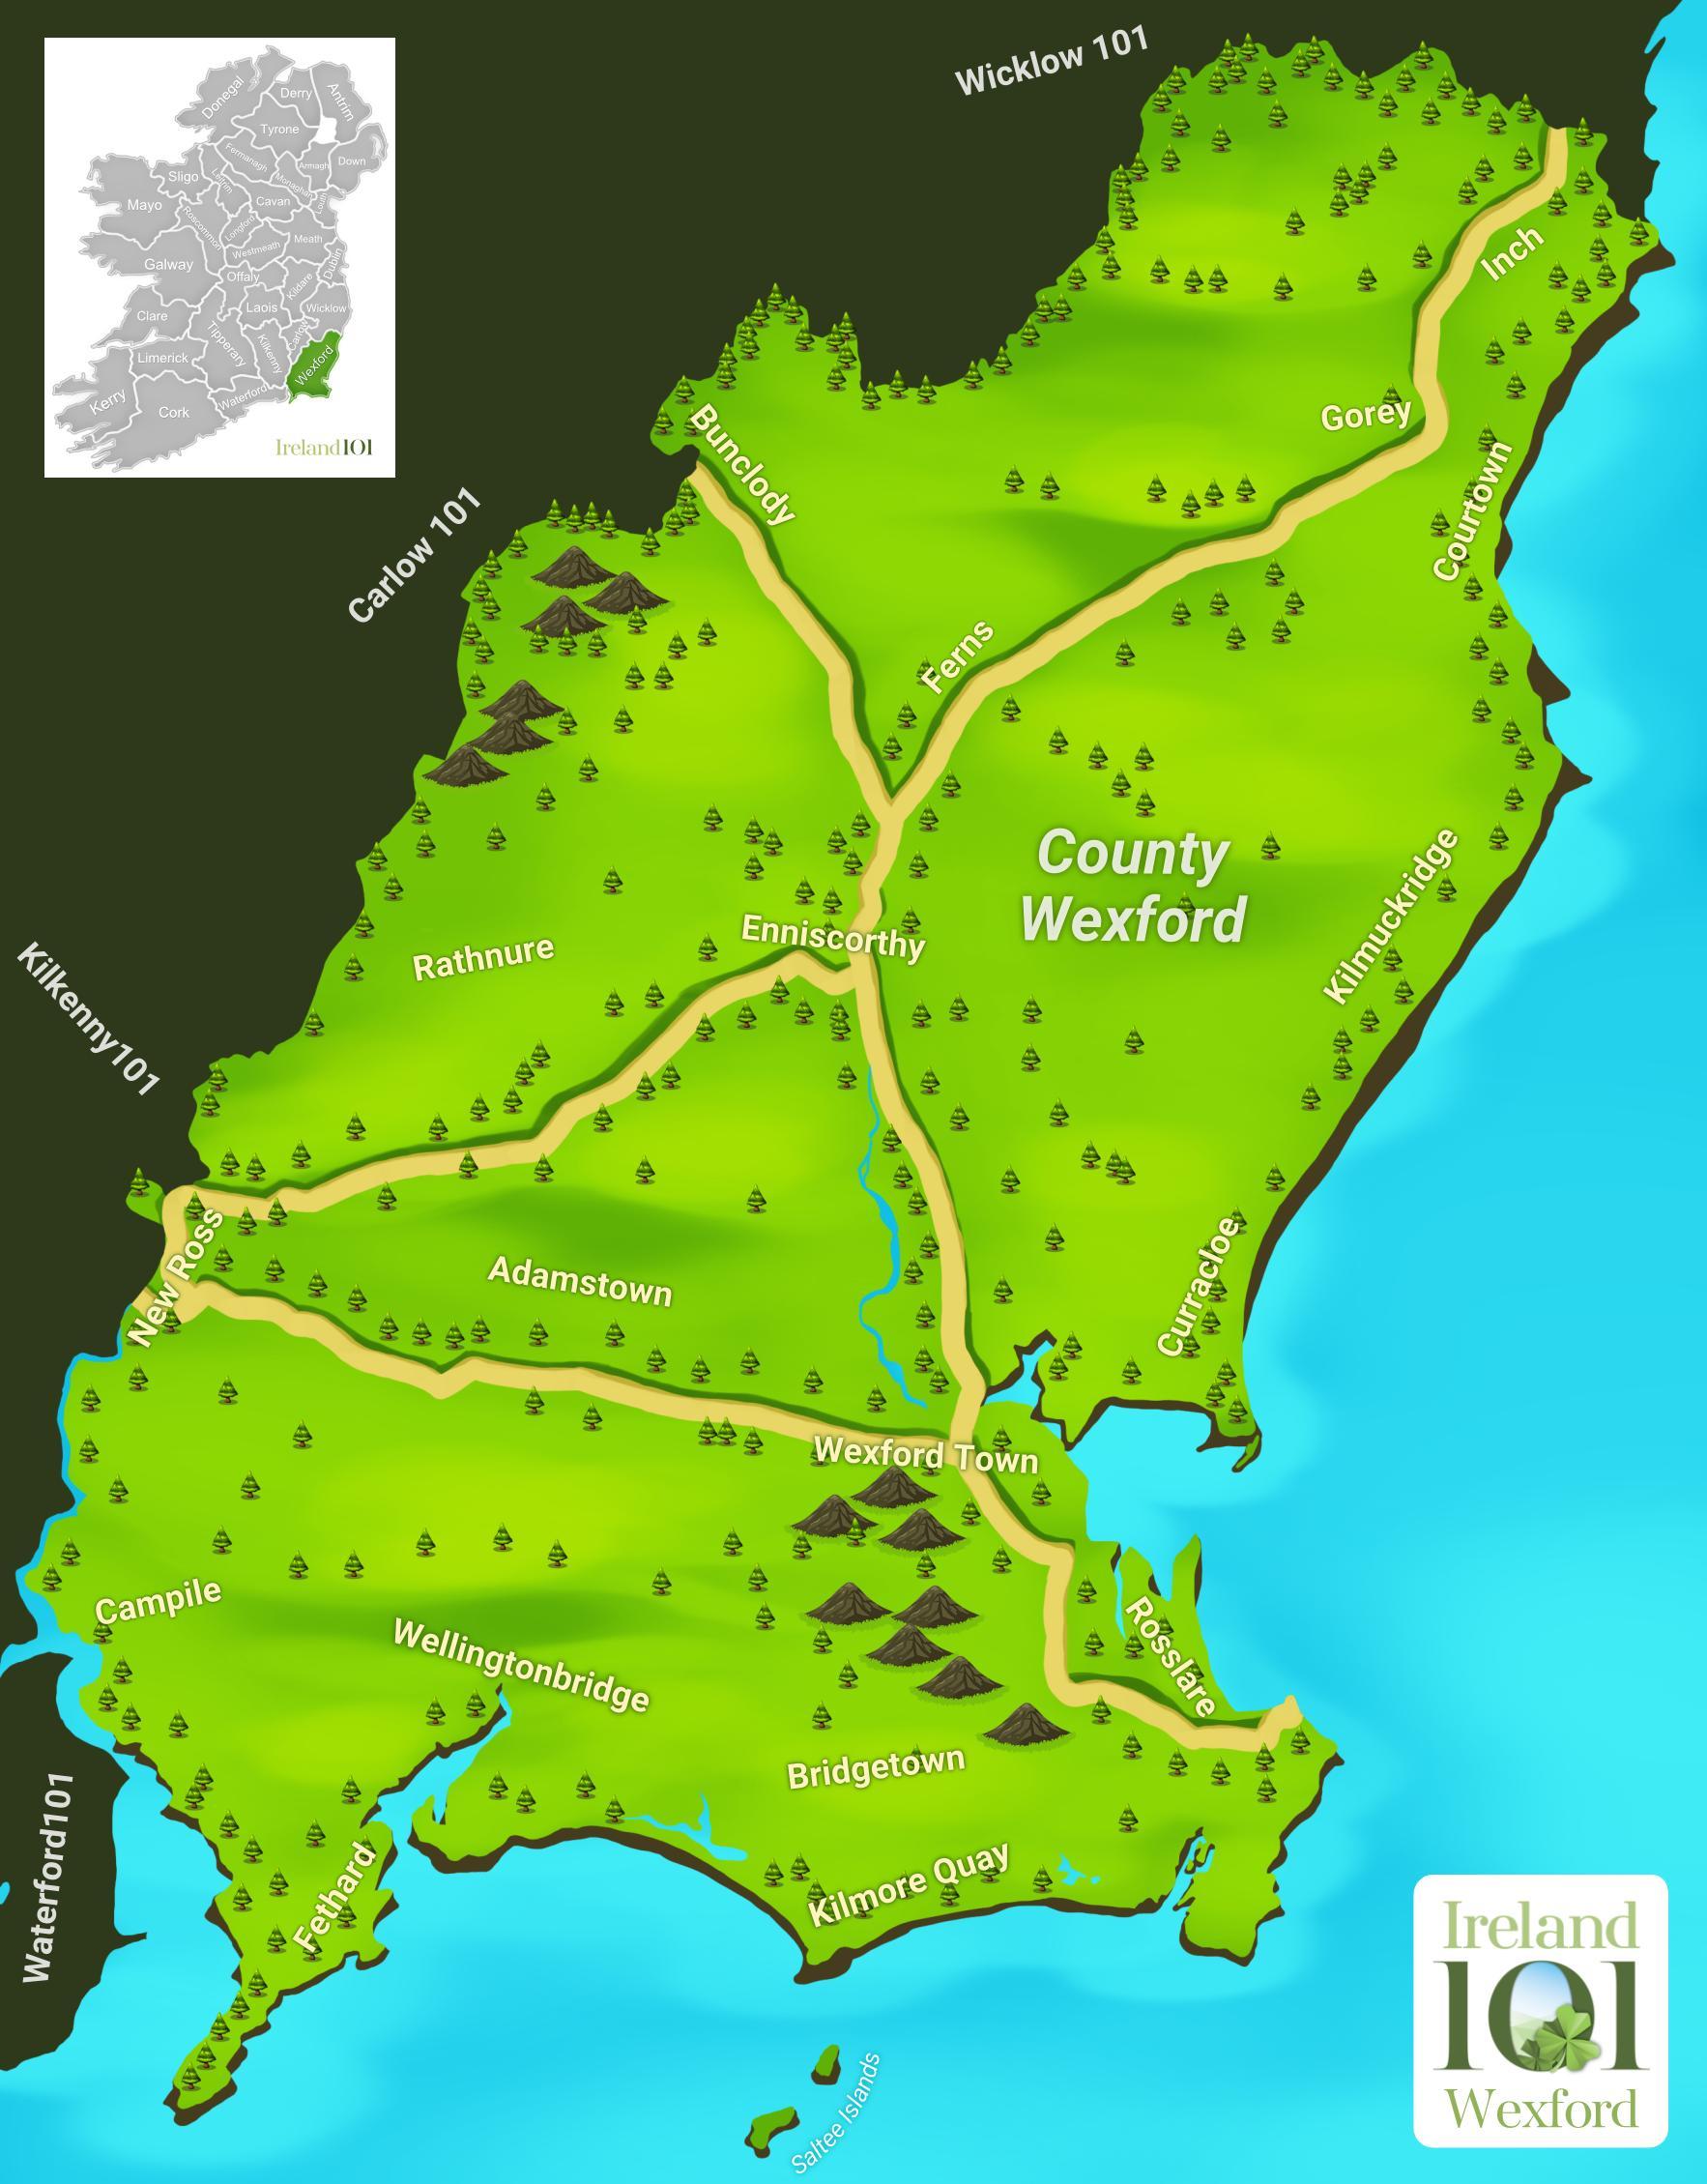 Map Of Wexford County Ireland.Counties Of Ireland Wexford Ireland